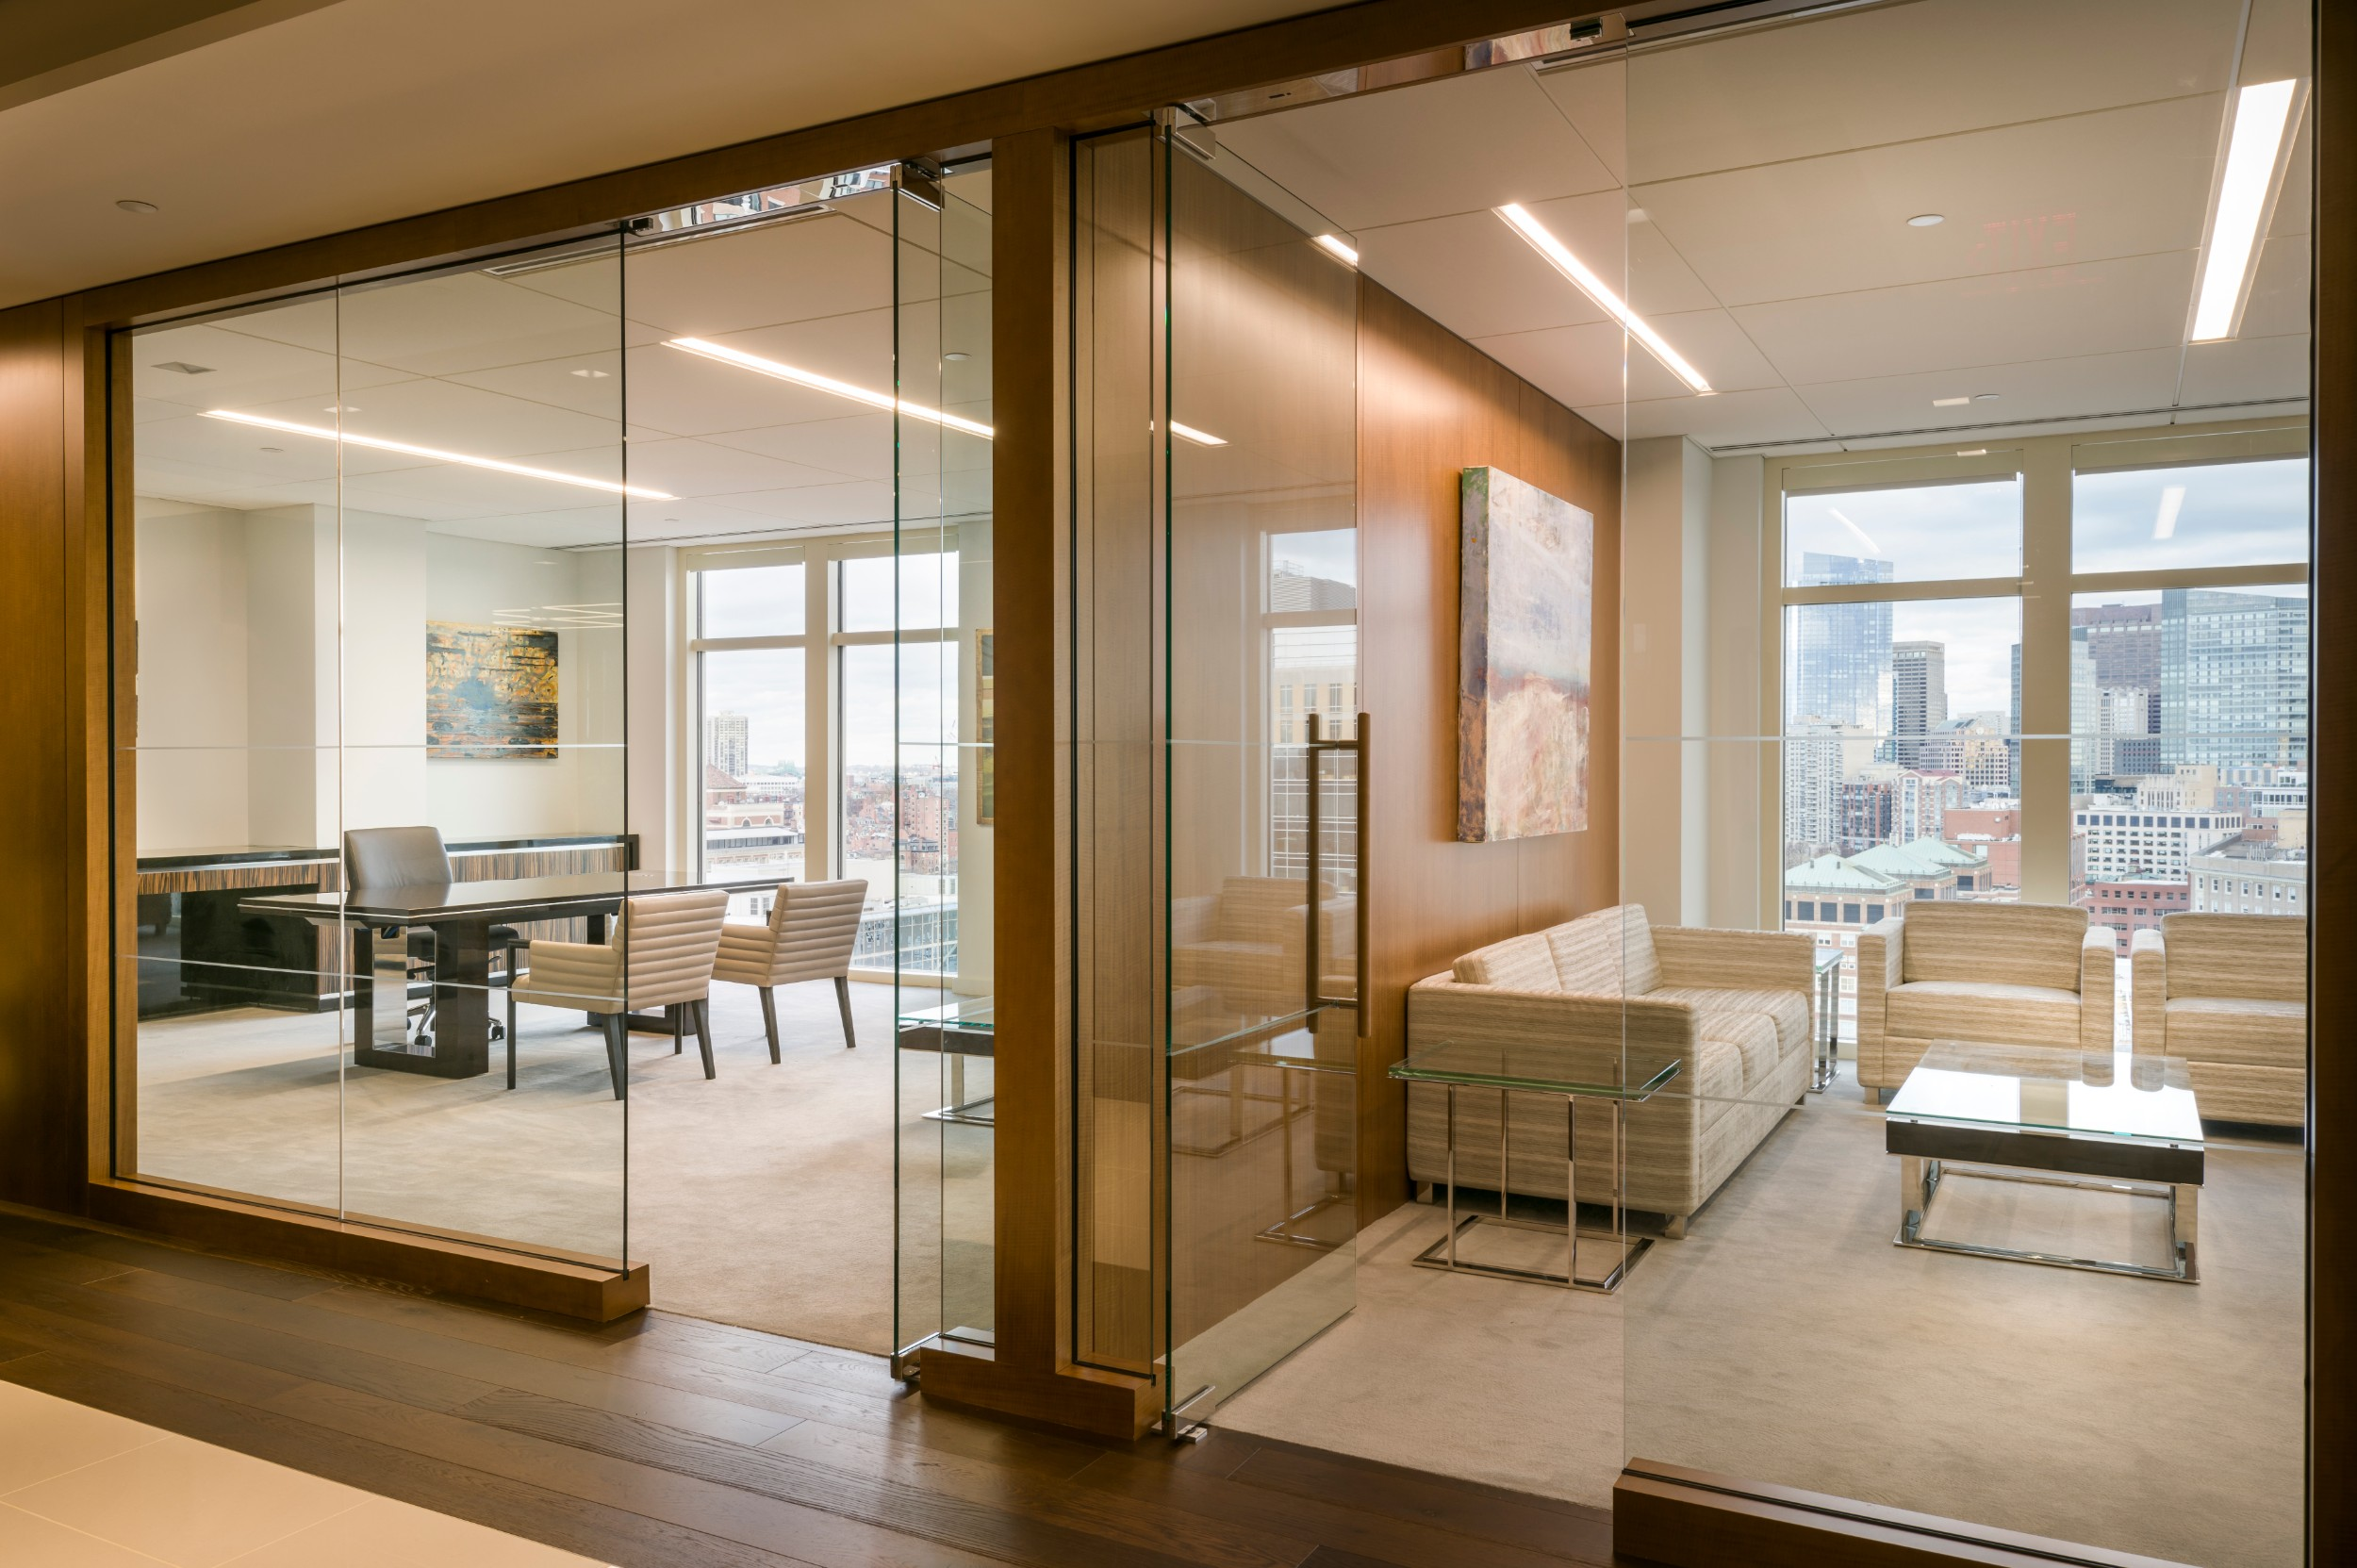 Corderman_Construction_Martignetti_Companies_Interior_Office_Buildout_Exterior_Office_View_2.jpg